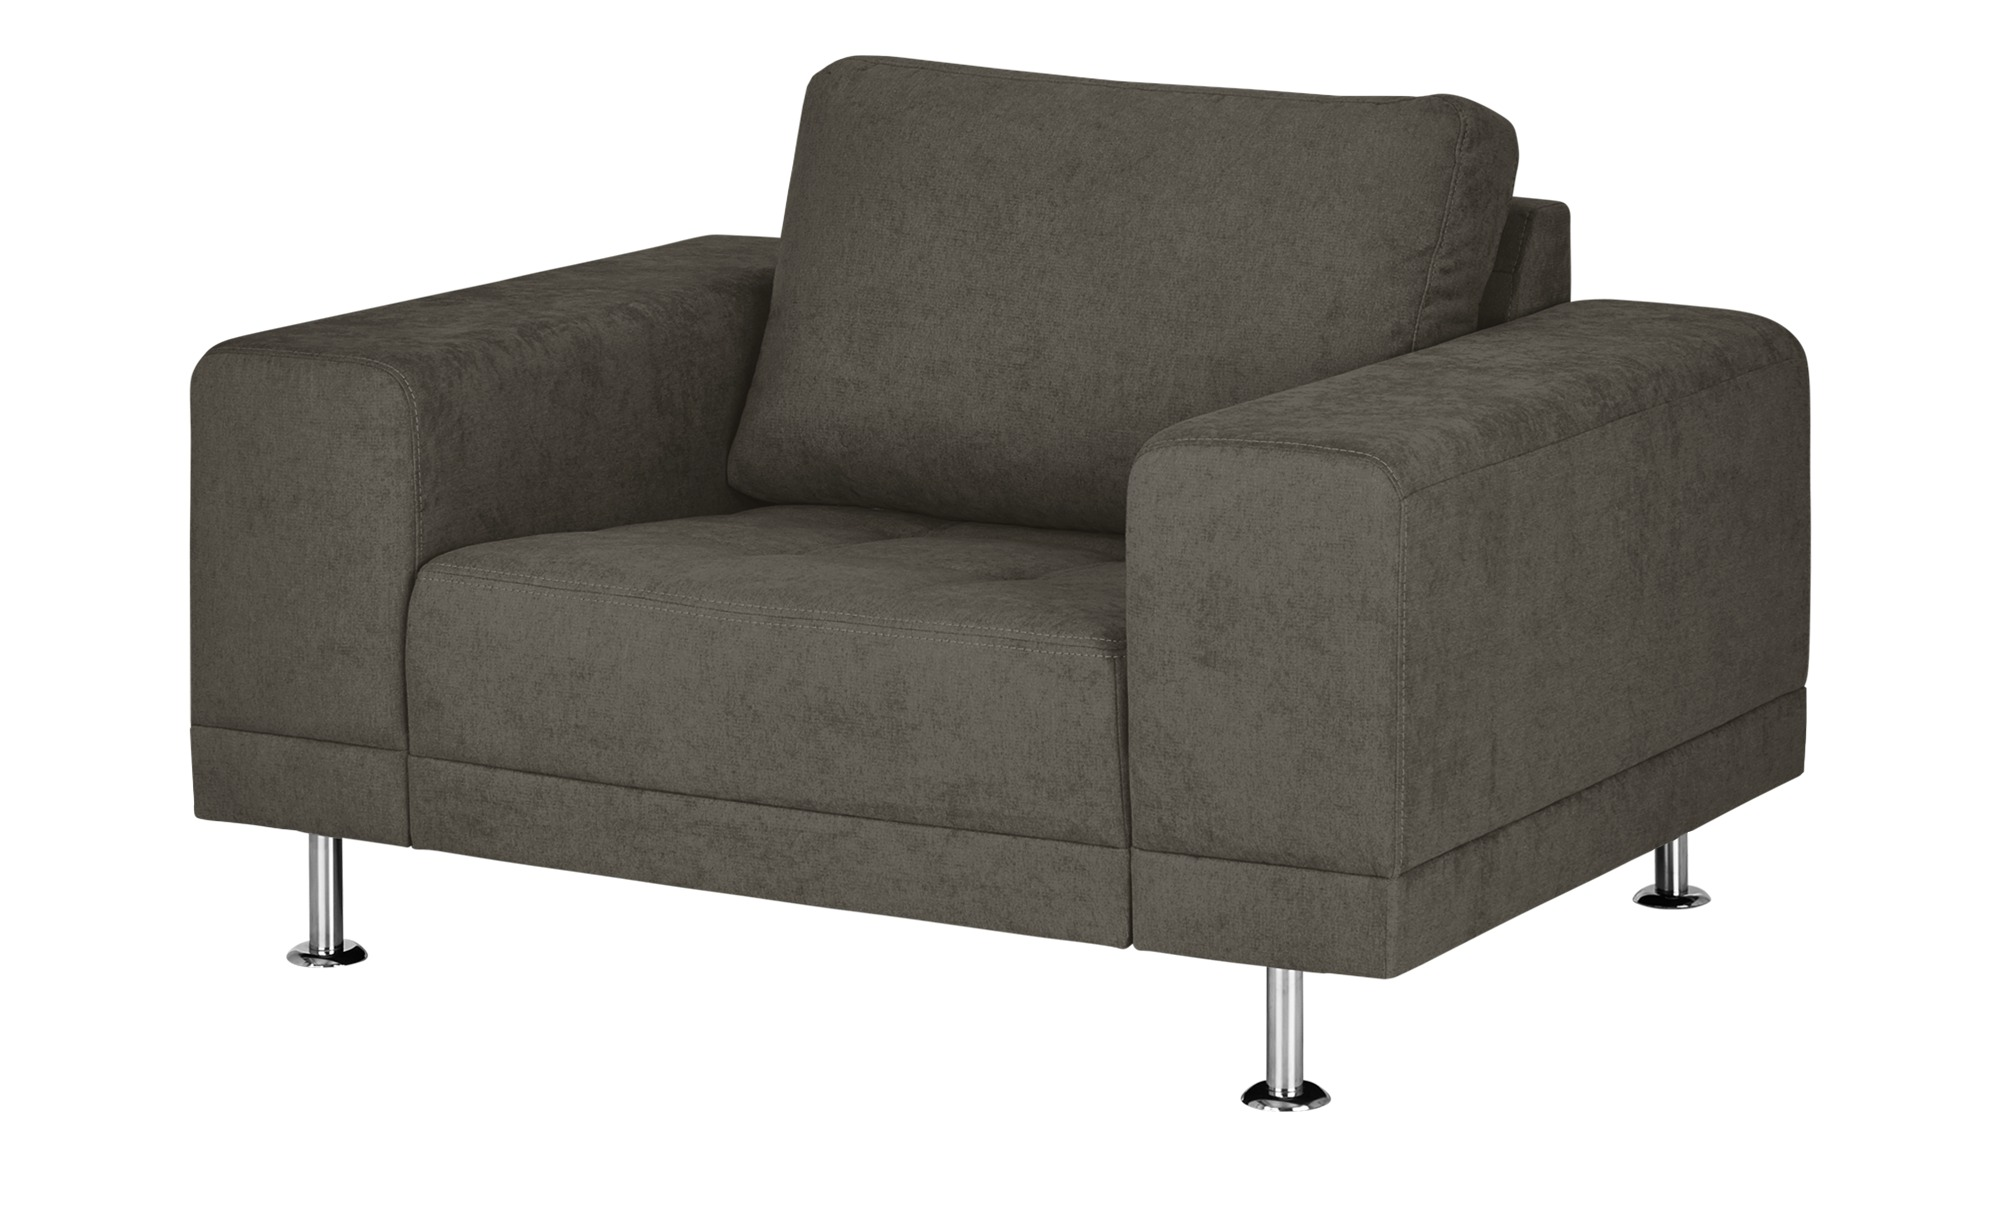 Full Size of Wohnzimmer Sessel Ikea Relaxsessel Sessel Tv Wohnzimmer Sessel Hocker Beinablage Fernsehsessel Drehstuhl (schwarz) Wohnzimmer Sessel Möbelix Wohnzimmer Sessel Ergonomisch Wohnzimmer Wohnzimmer Sessel